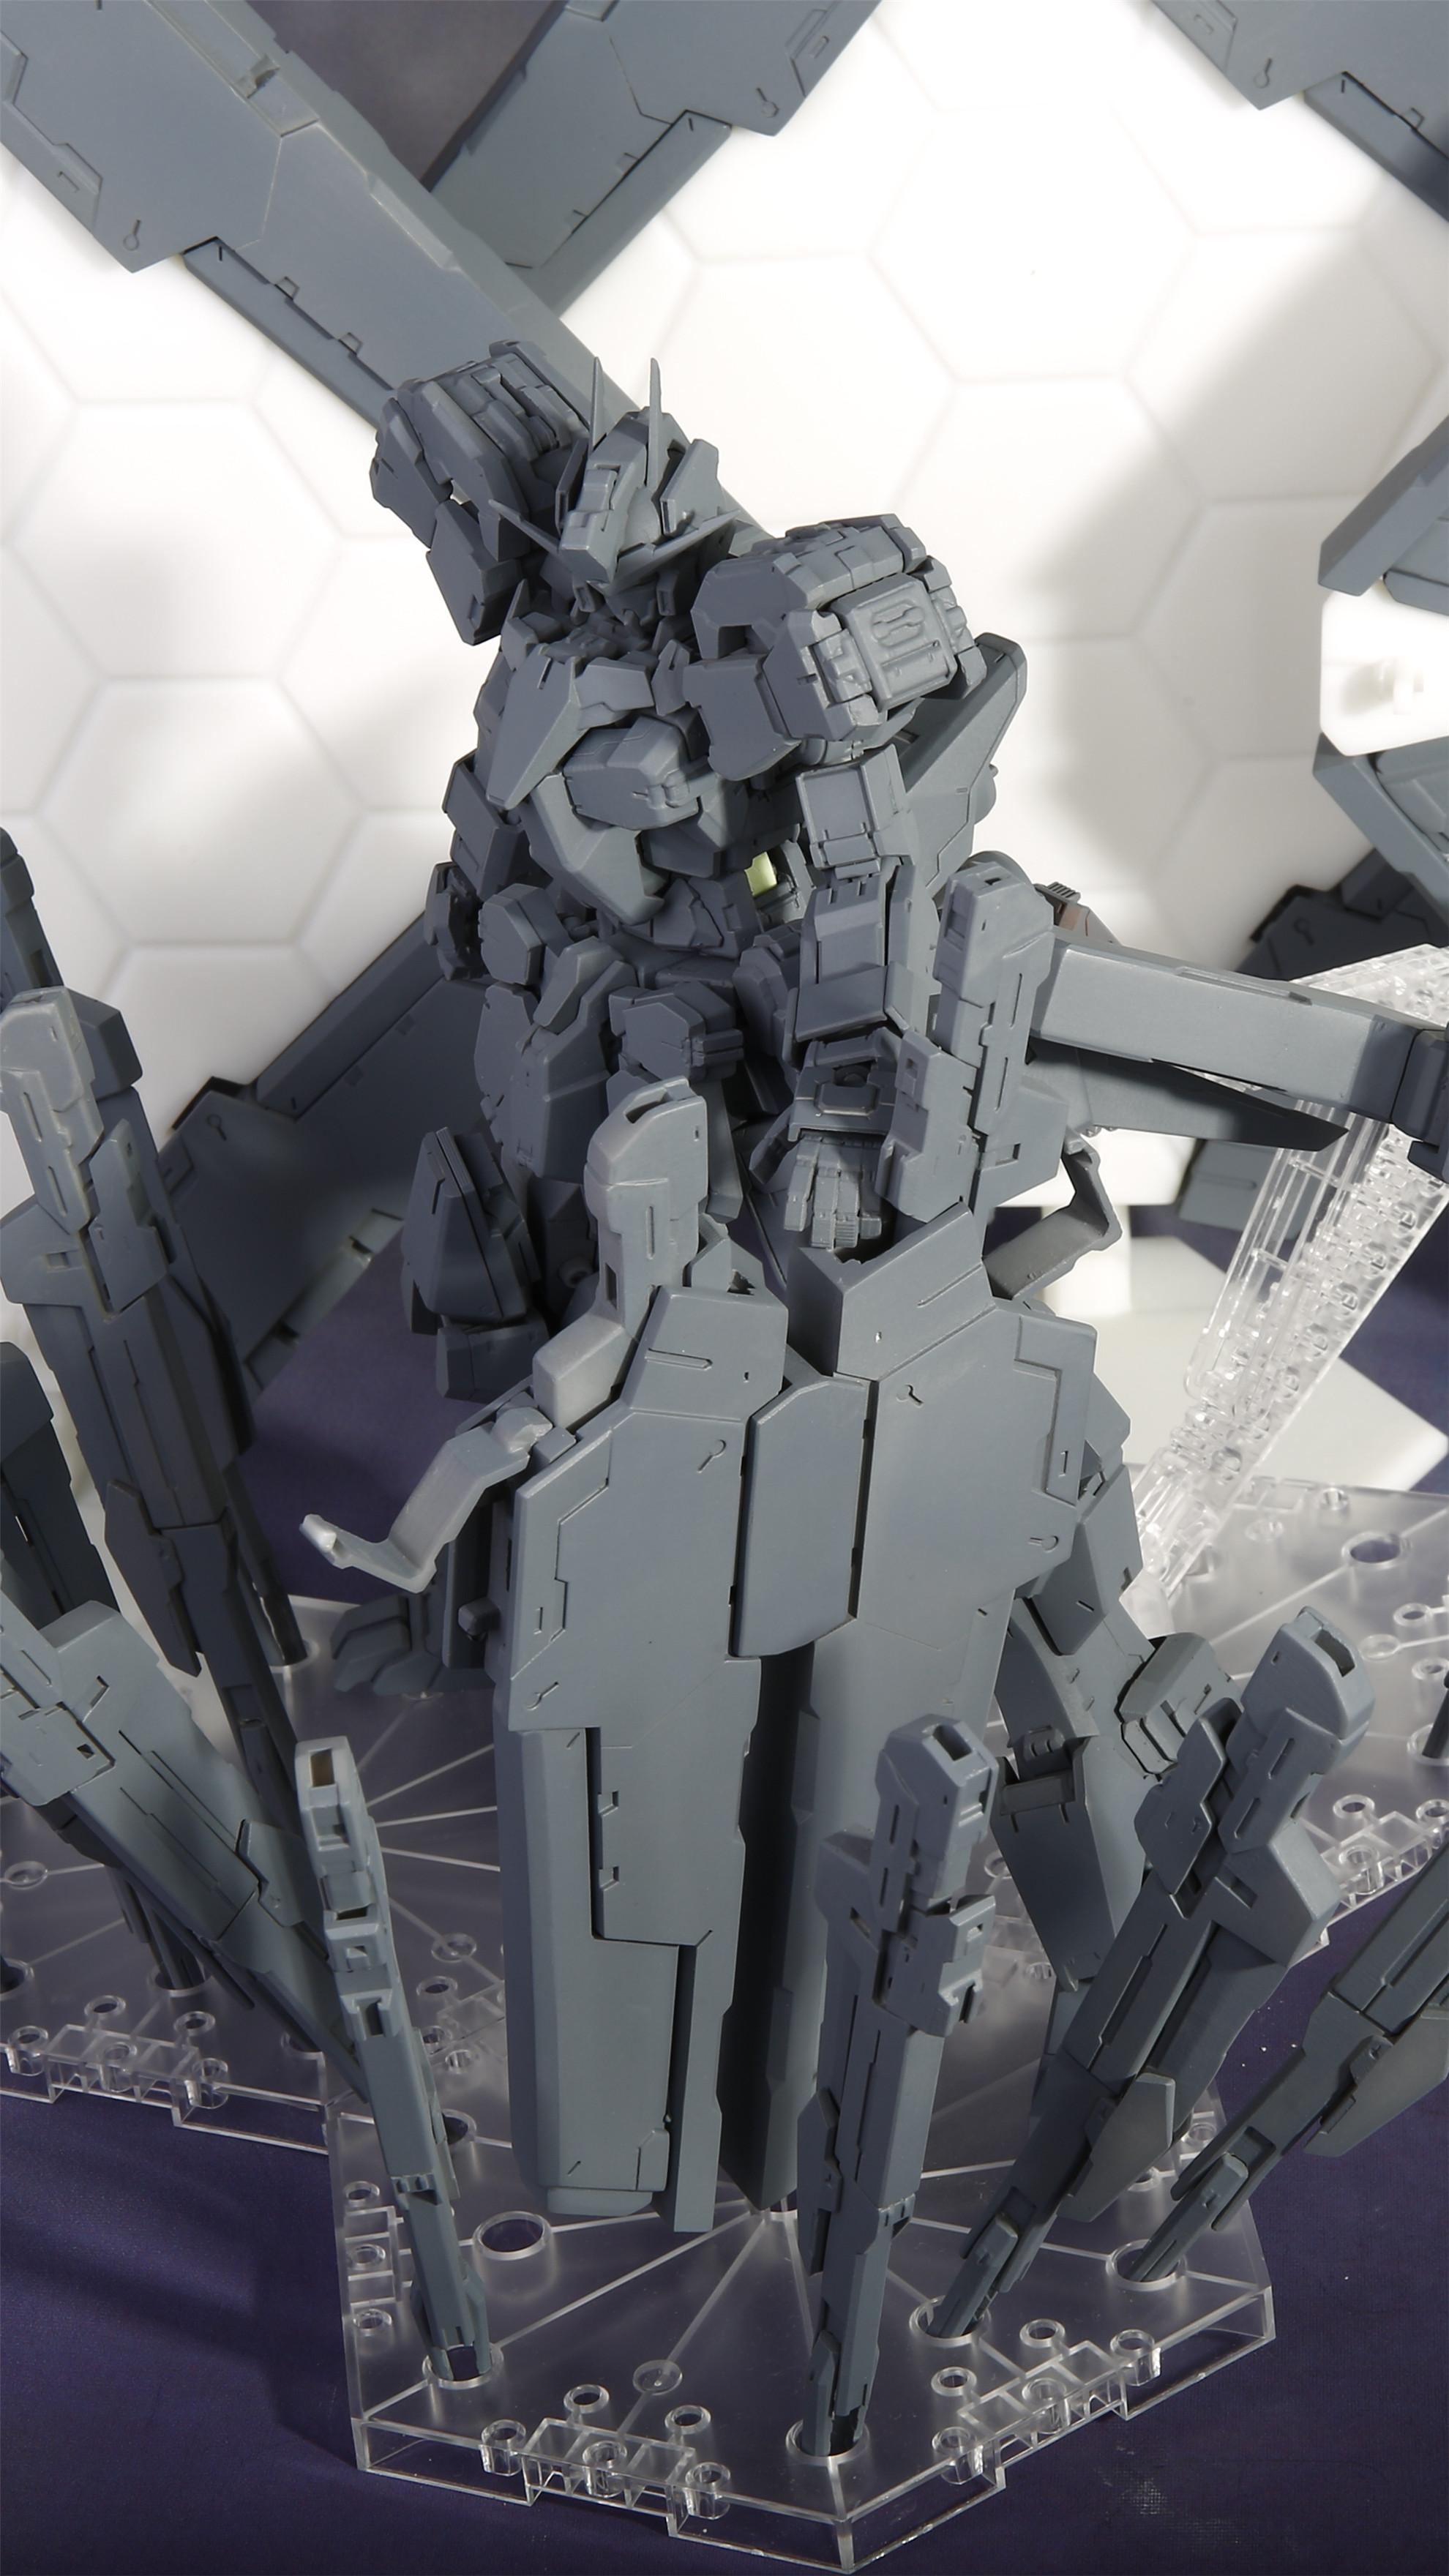 G652_Gundam_Zabanya_007.jpg